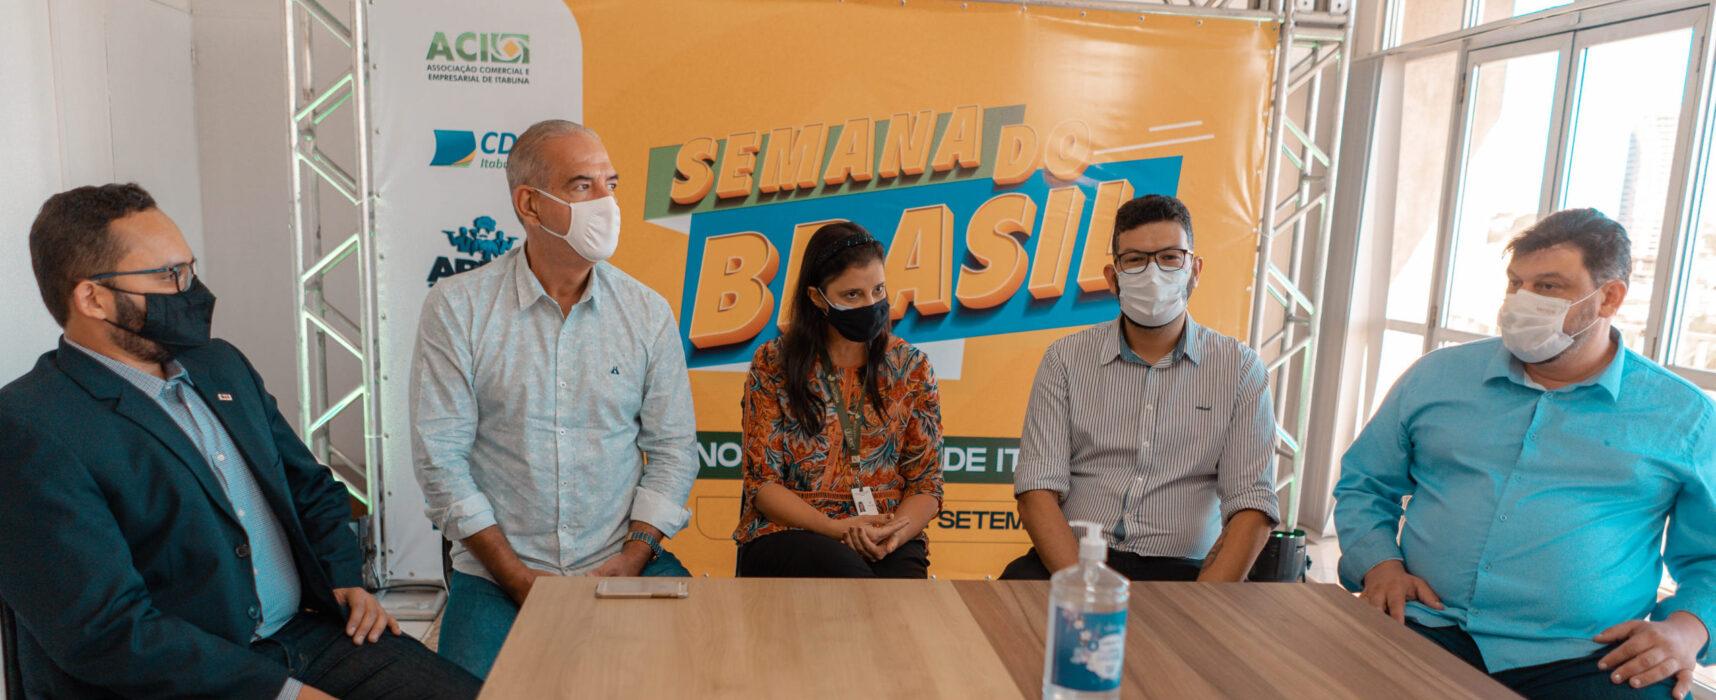 Semana do Brasil vai aquecer o comércio de Itabuna entre 2 e 12 de setembro